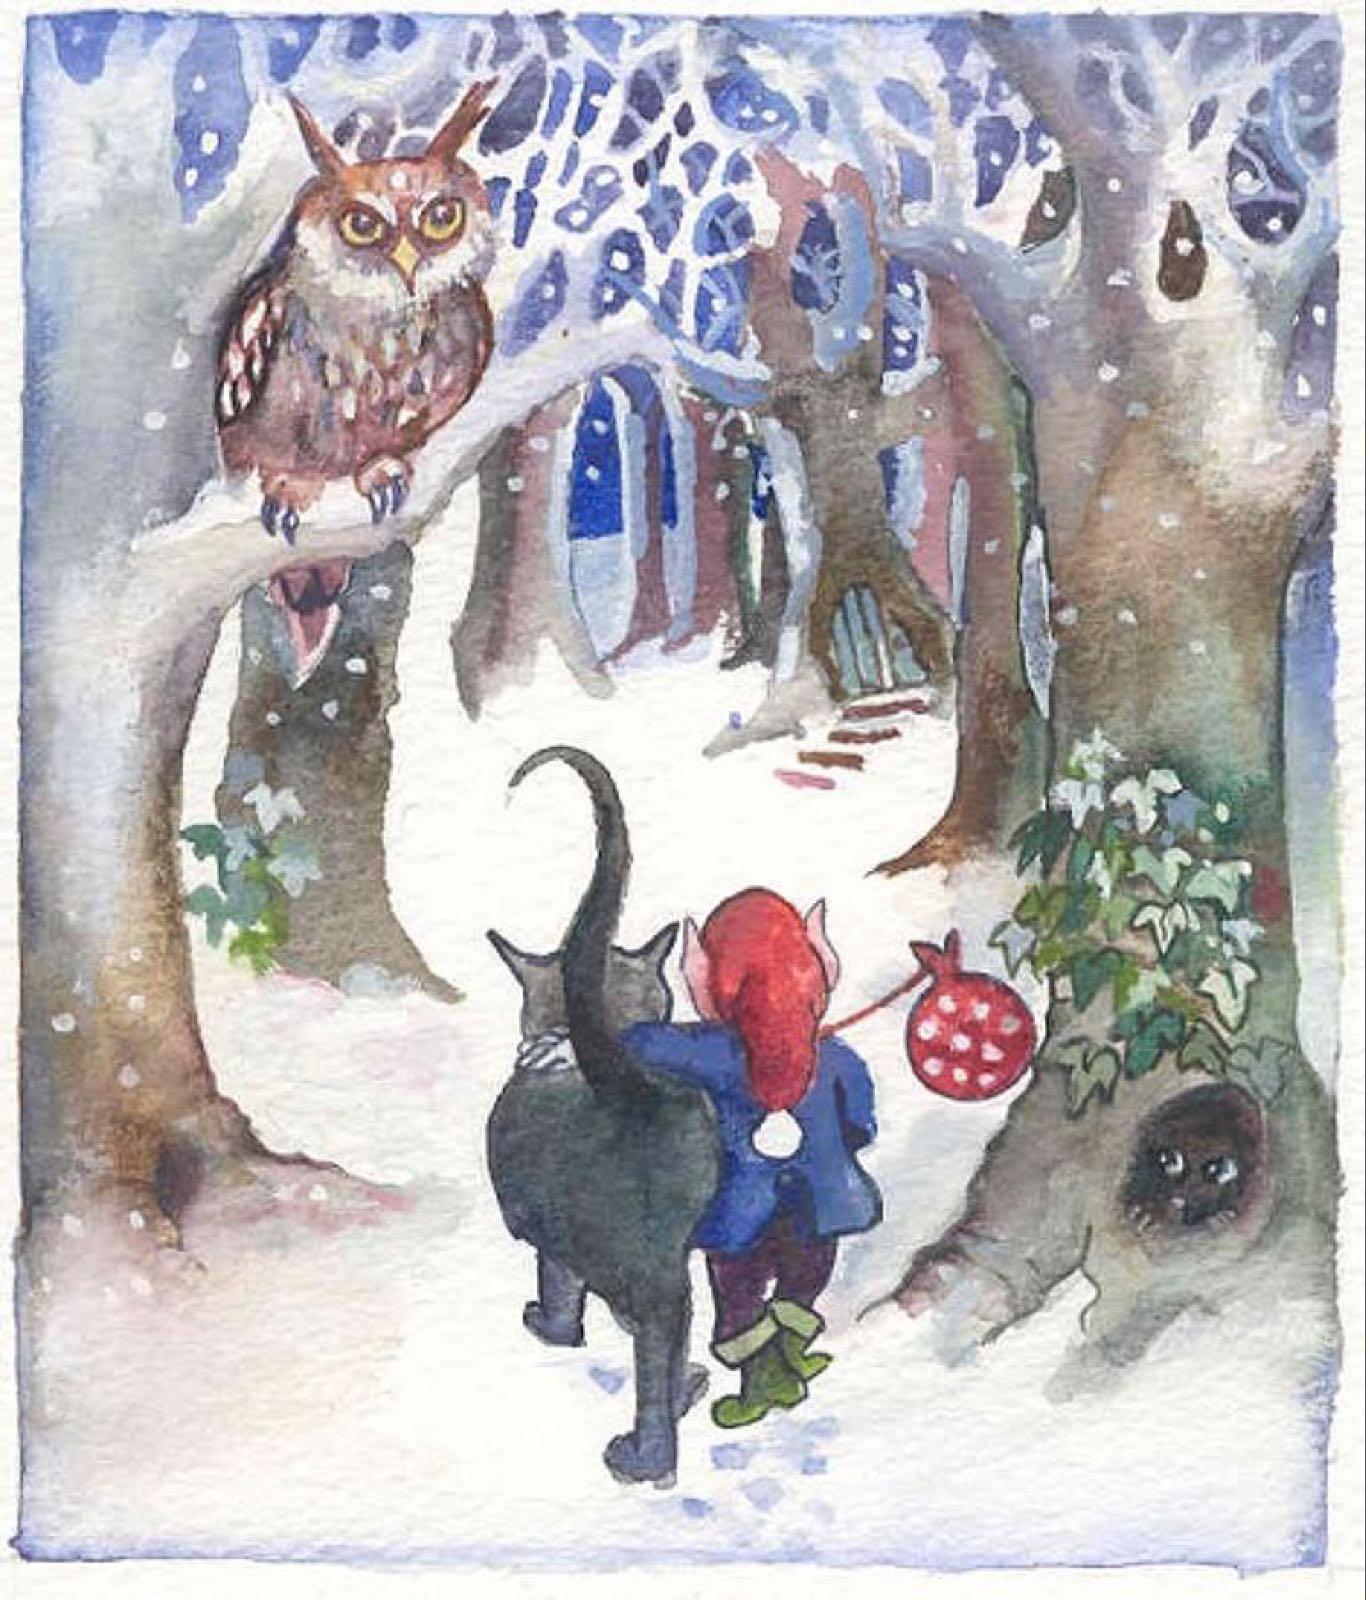 'Leaving Home' Furzedown Gallery Mini Card